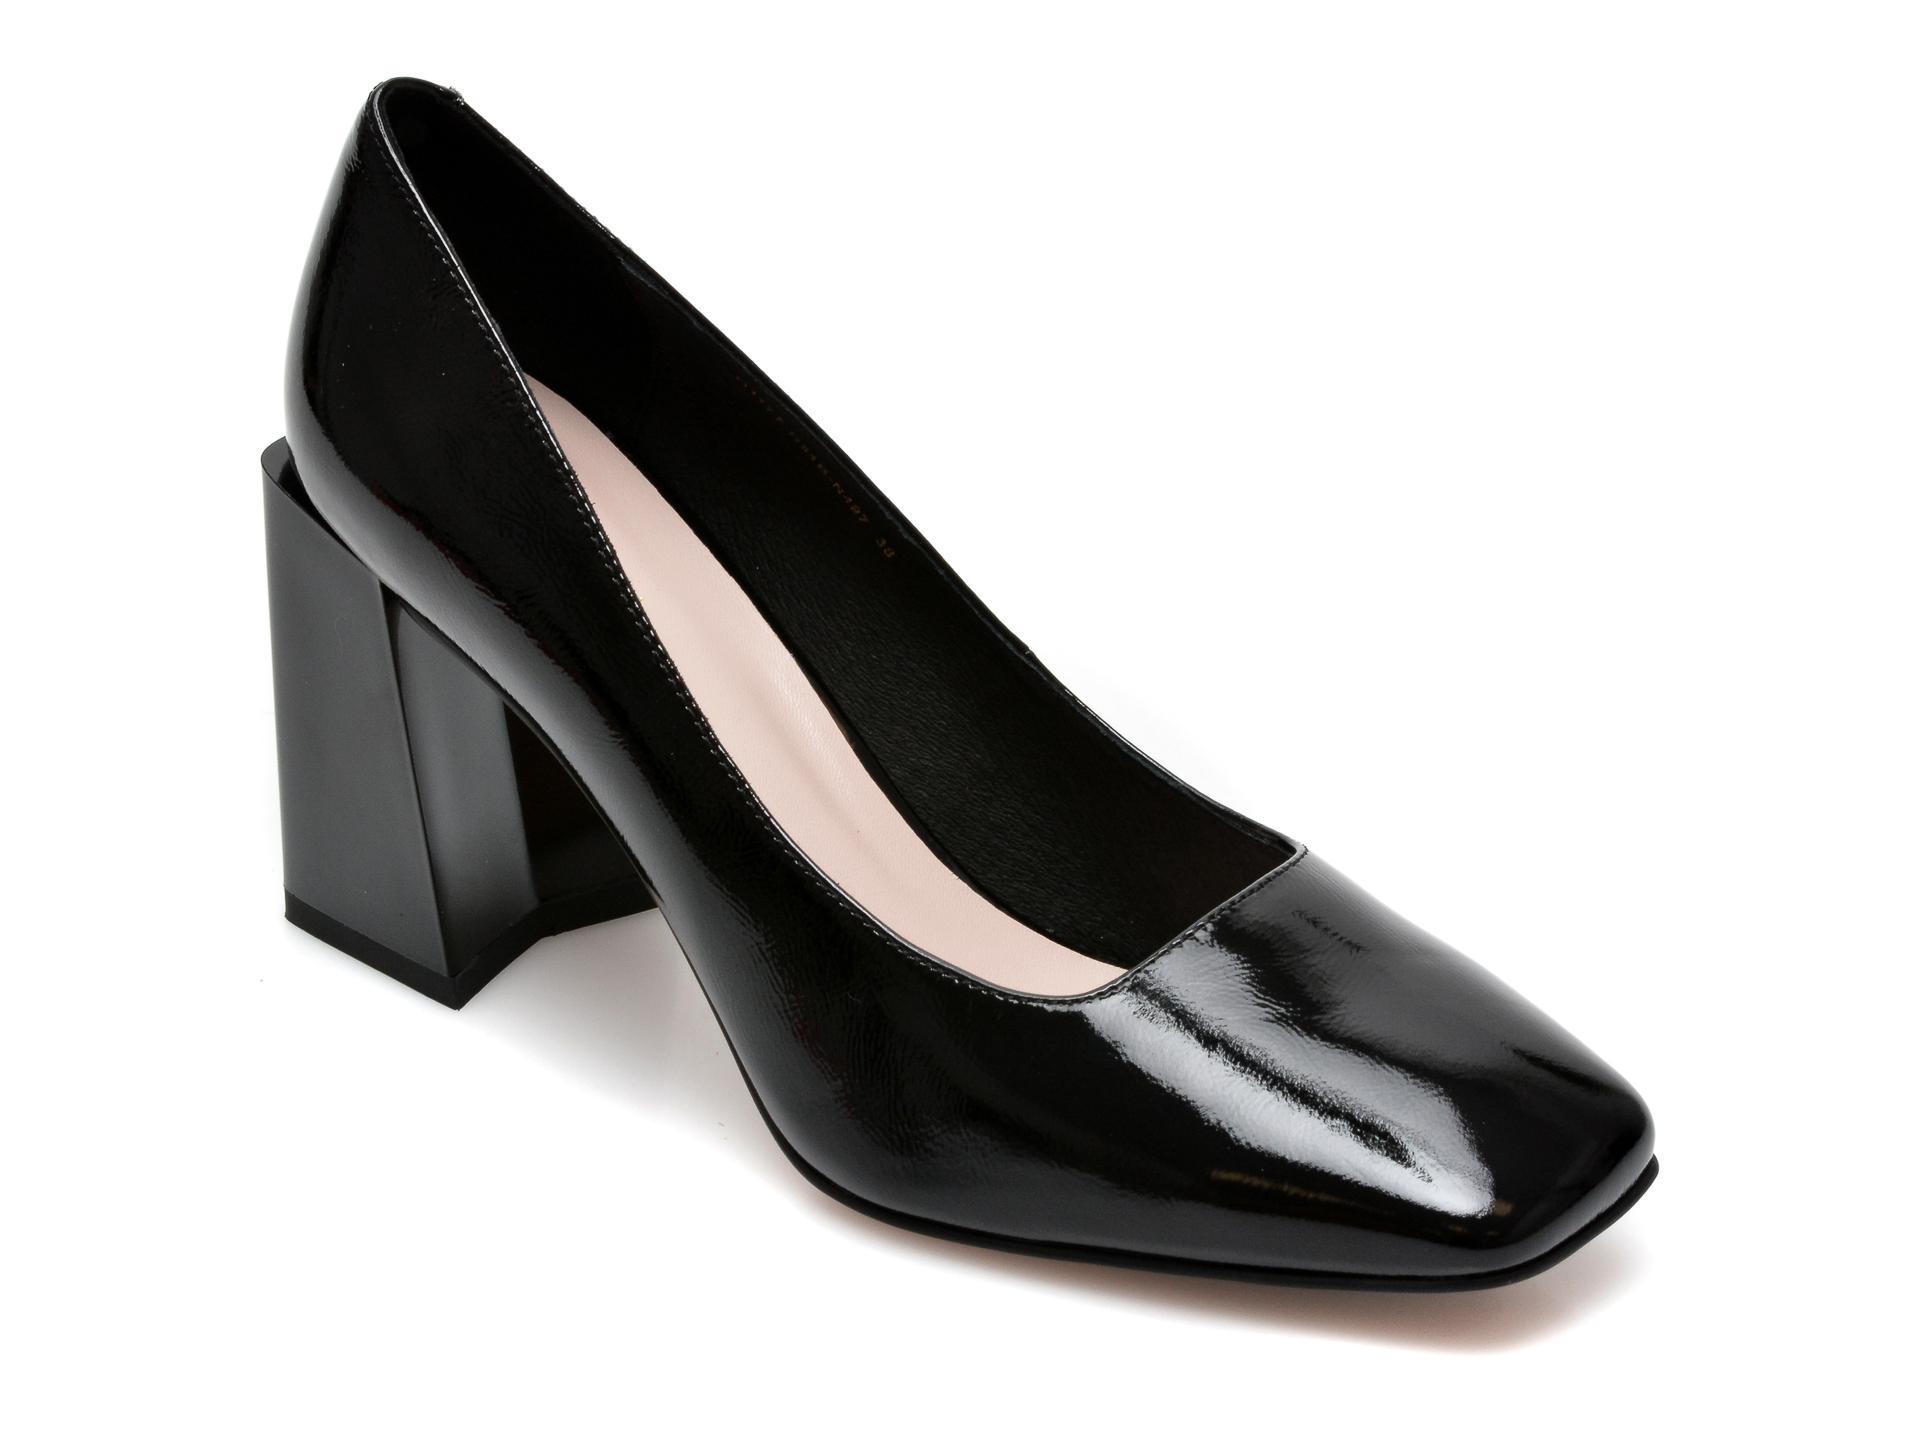 Pantofi EPICA negri, G1177R5, din piele naturala lacuita imagine otter.ro 2021